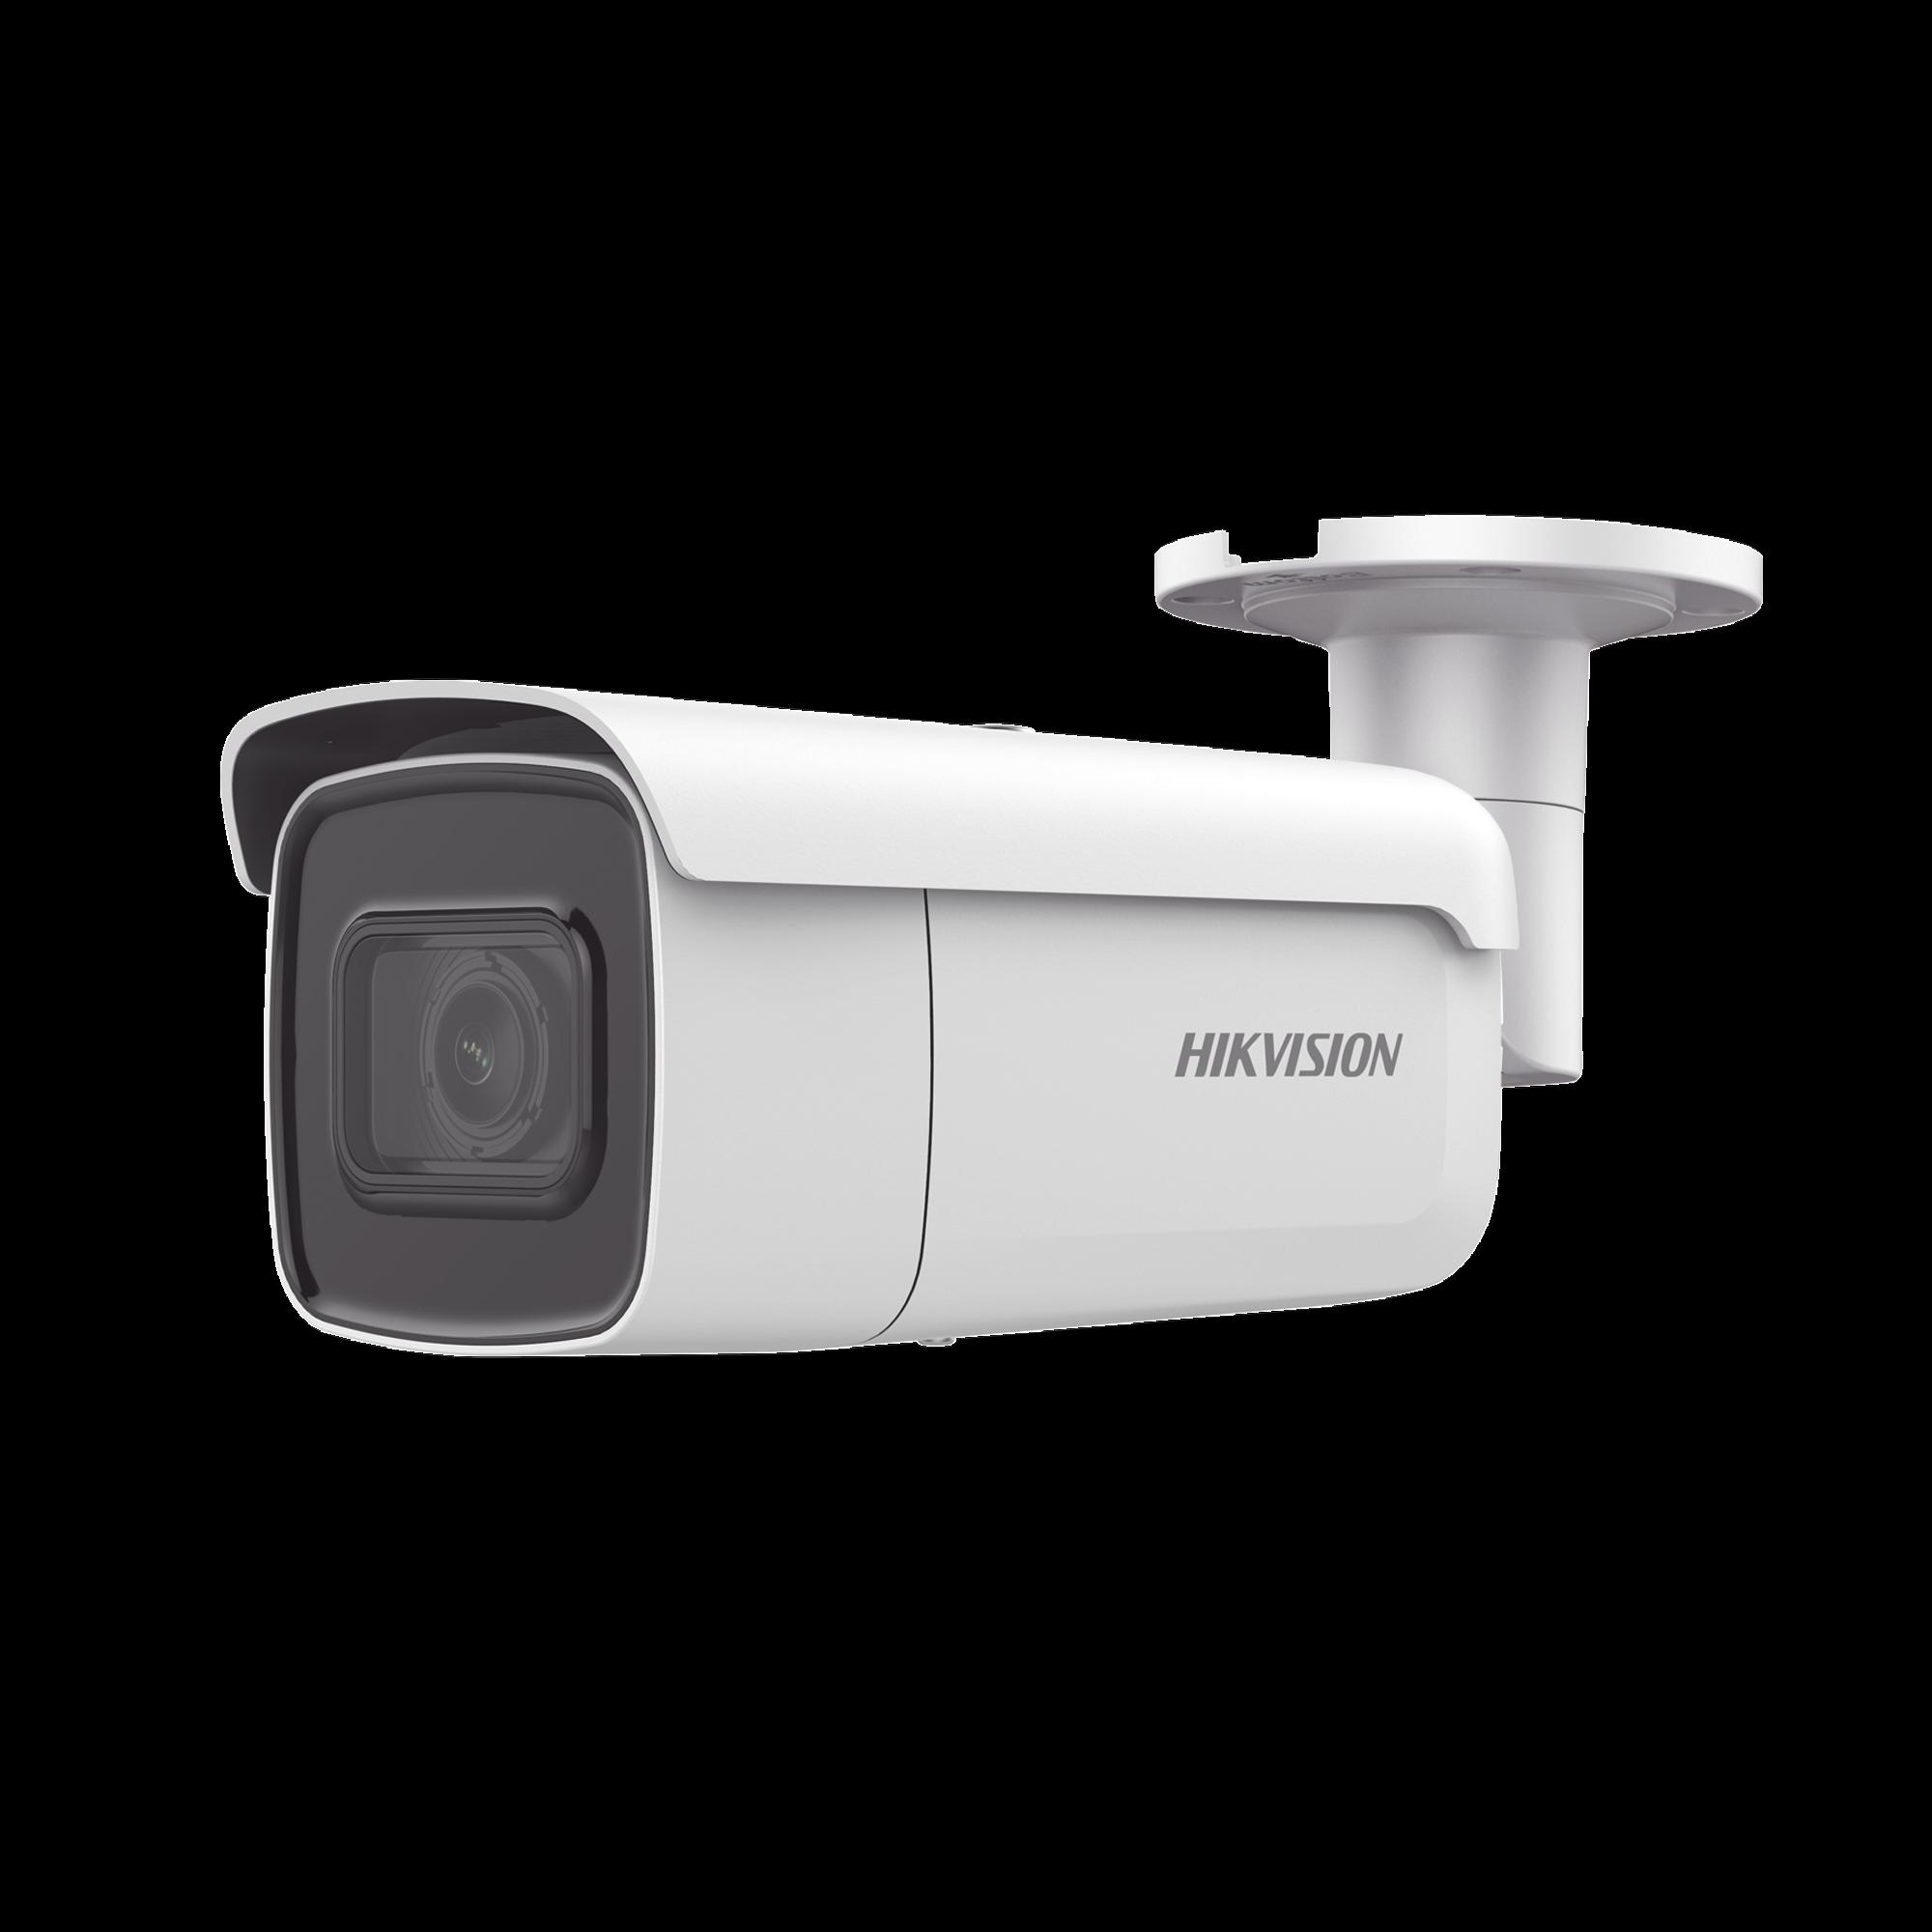 Bala IP 8 Megapixel (4K) / Serie PRO + /  50 mts IR EXIR / Lente Mot. 2.8 a 12 mm / Ultra Baja Iluminación IP67 / IK10 / Videoanaliticos Integrados / WDR 120dB / Audio y Alarmas / PoE+